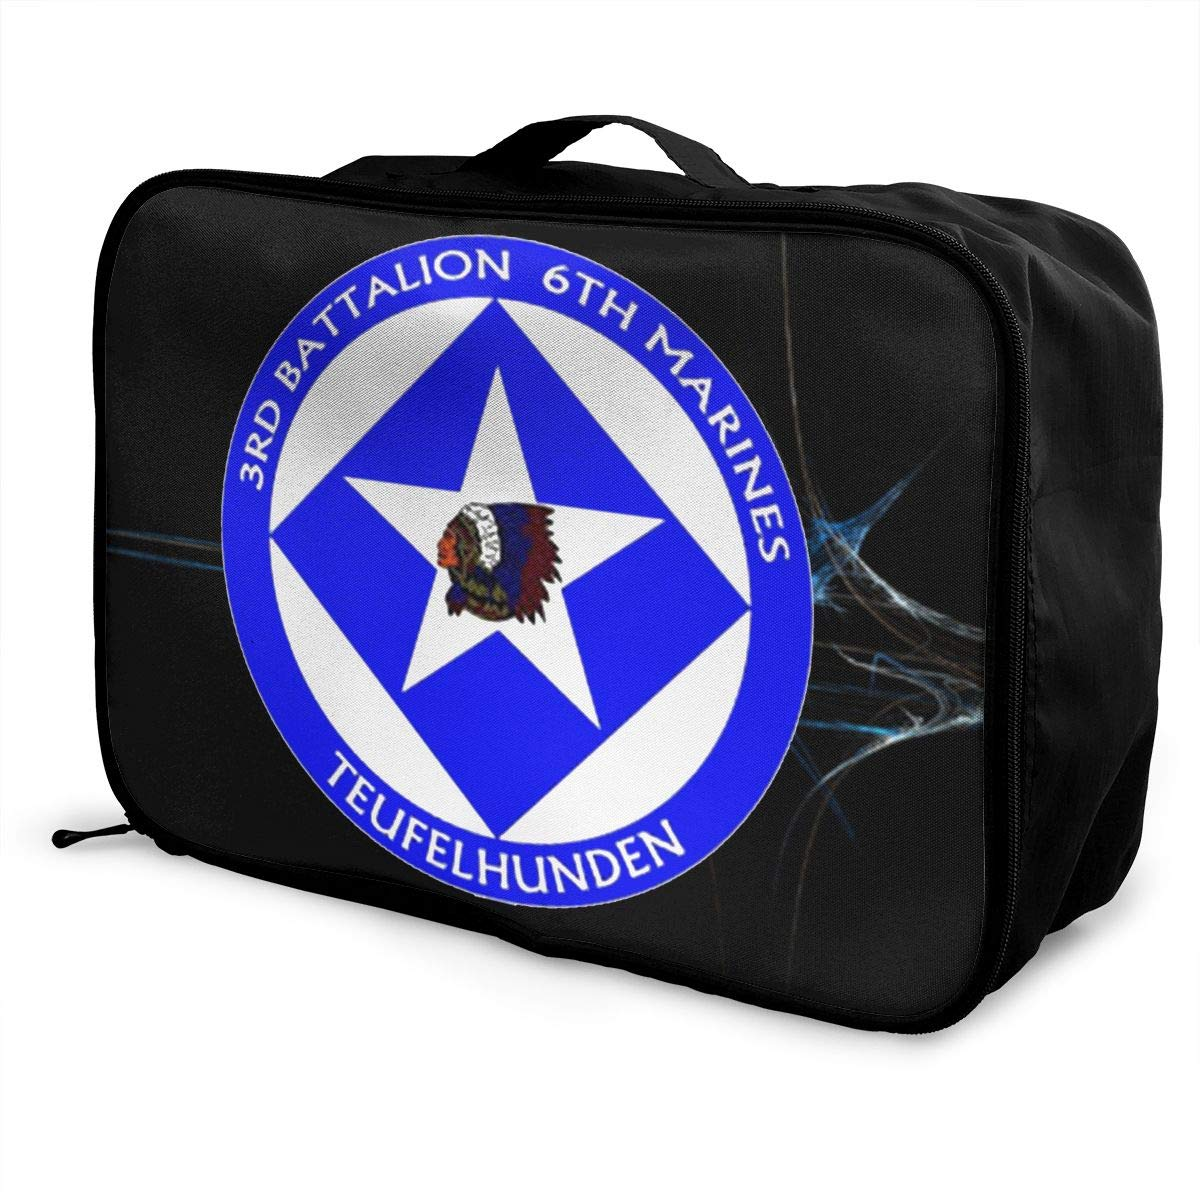 Unisex Travel Duffel Bag Waterproof Fashion Lightweight Large Capacity Portable Luggage Bag 3rd Battalion 6th Marines